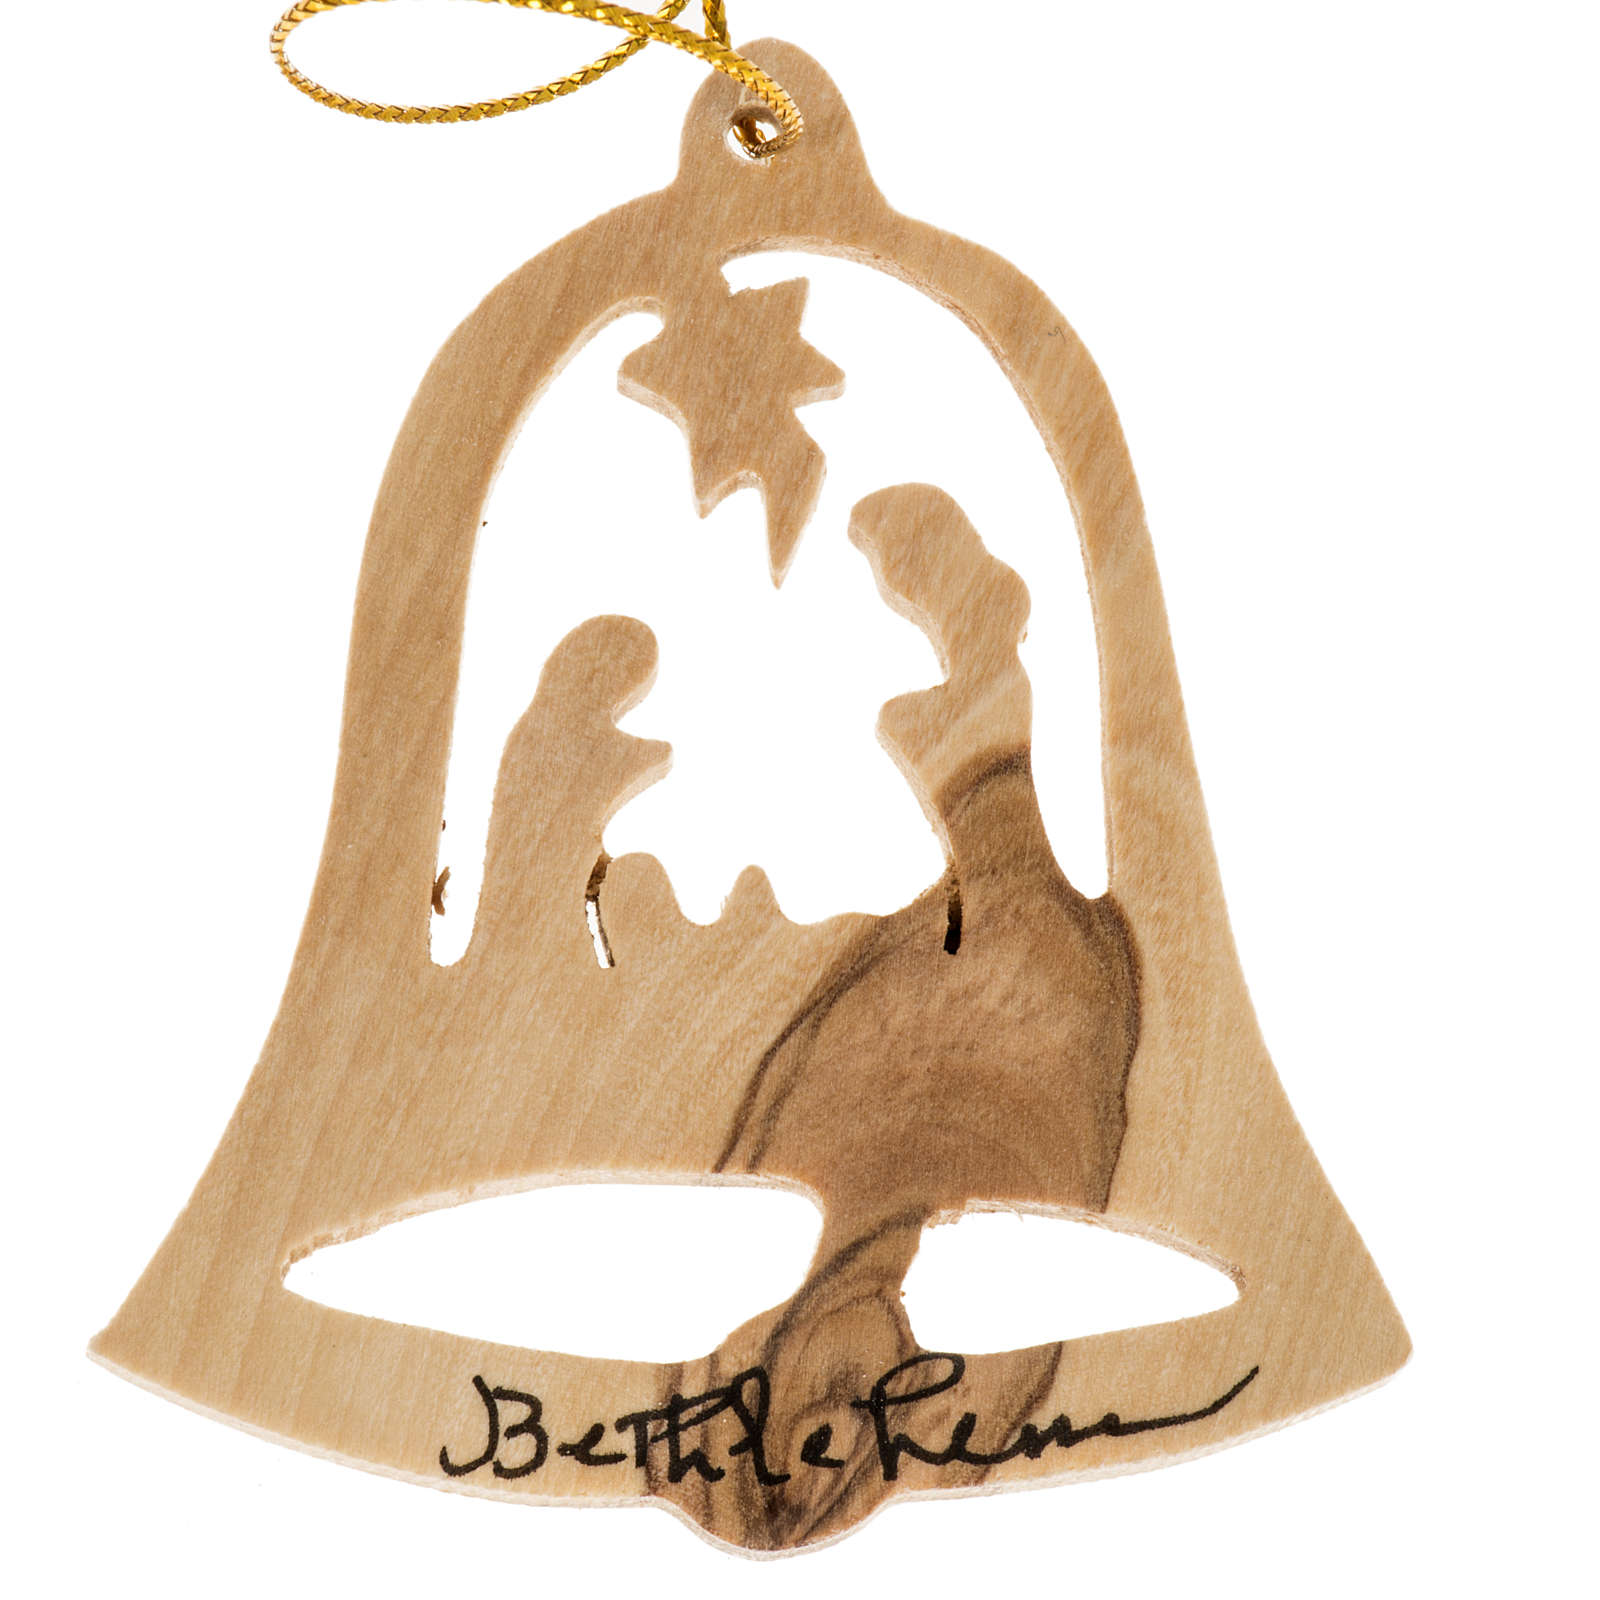 Christmas tree decoration, bell Bethlehem in Holy Land olive woo 4